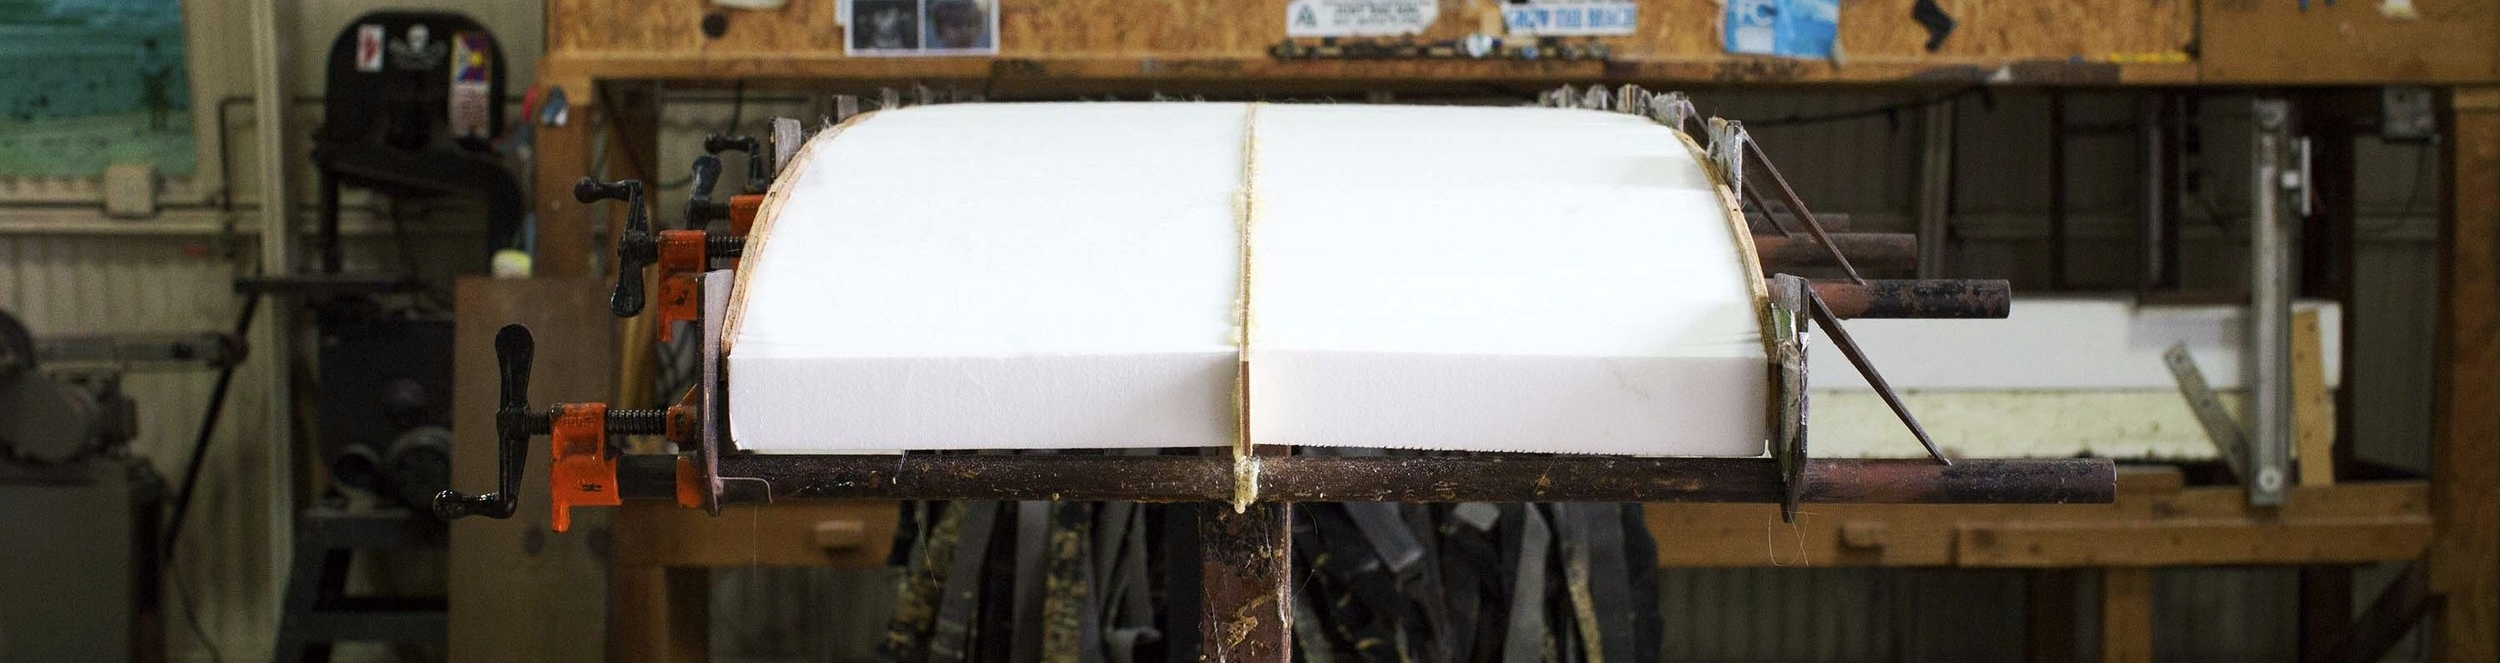 FCD Surfboards_Blank Construction_Foam_Tee Smith.jpg